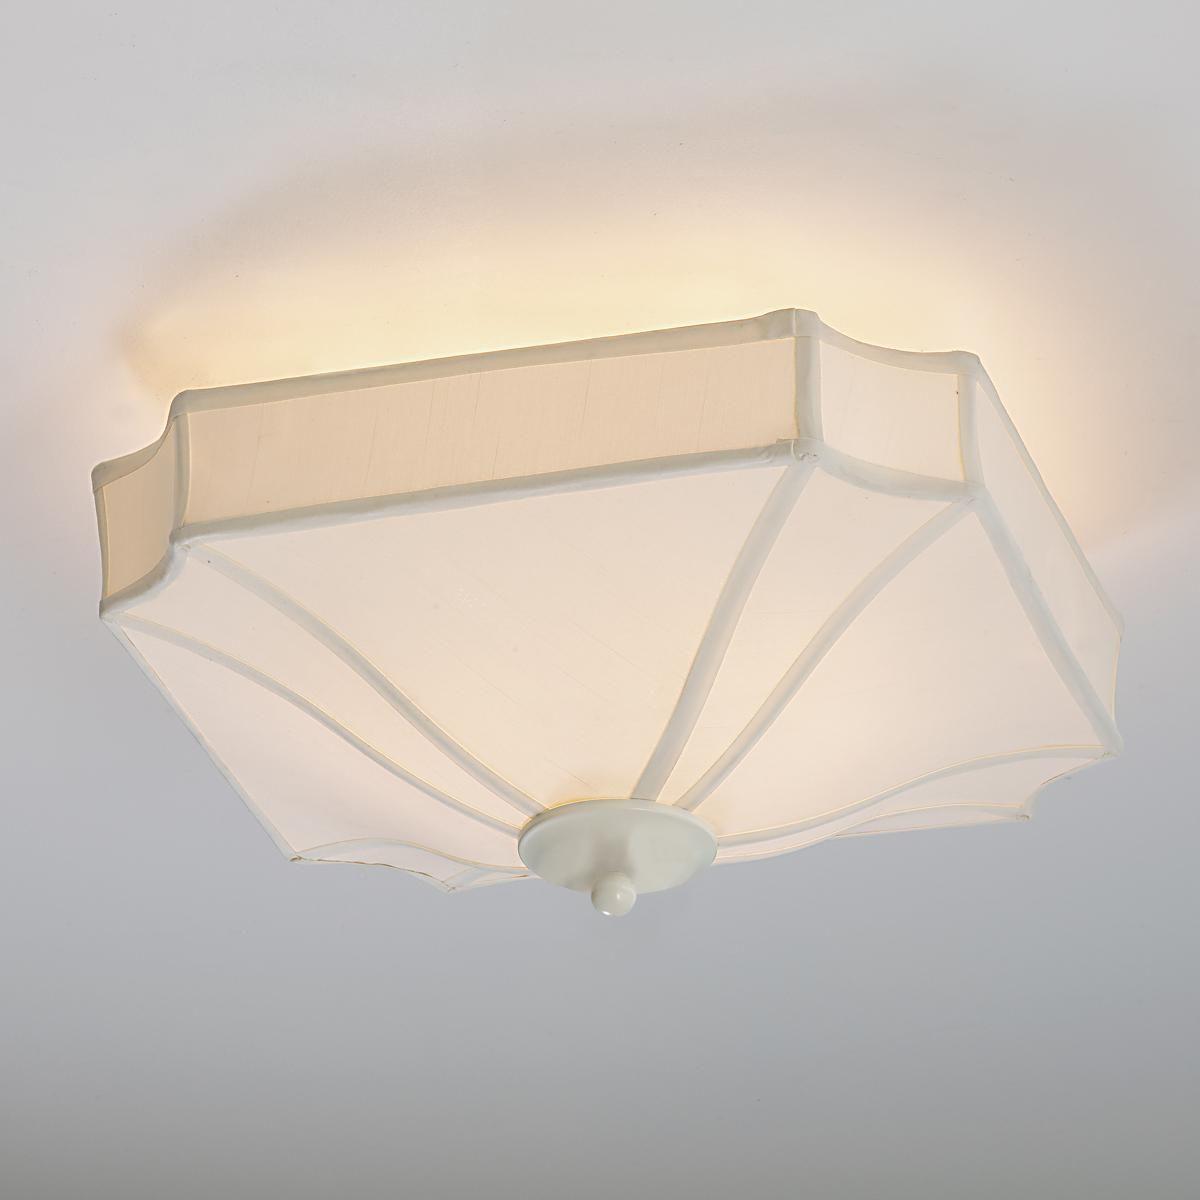 Cut Corner Shade Ceiling Light | Pinterest | Ceiling, Corner and ...